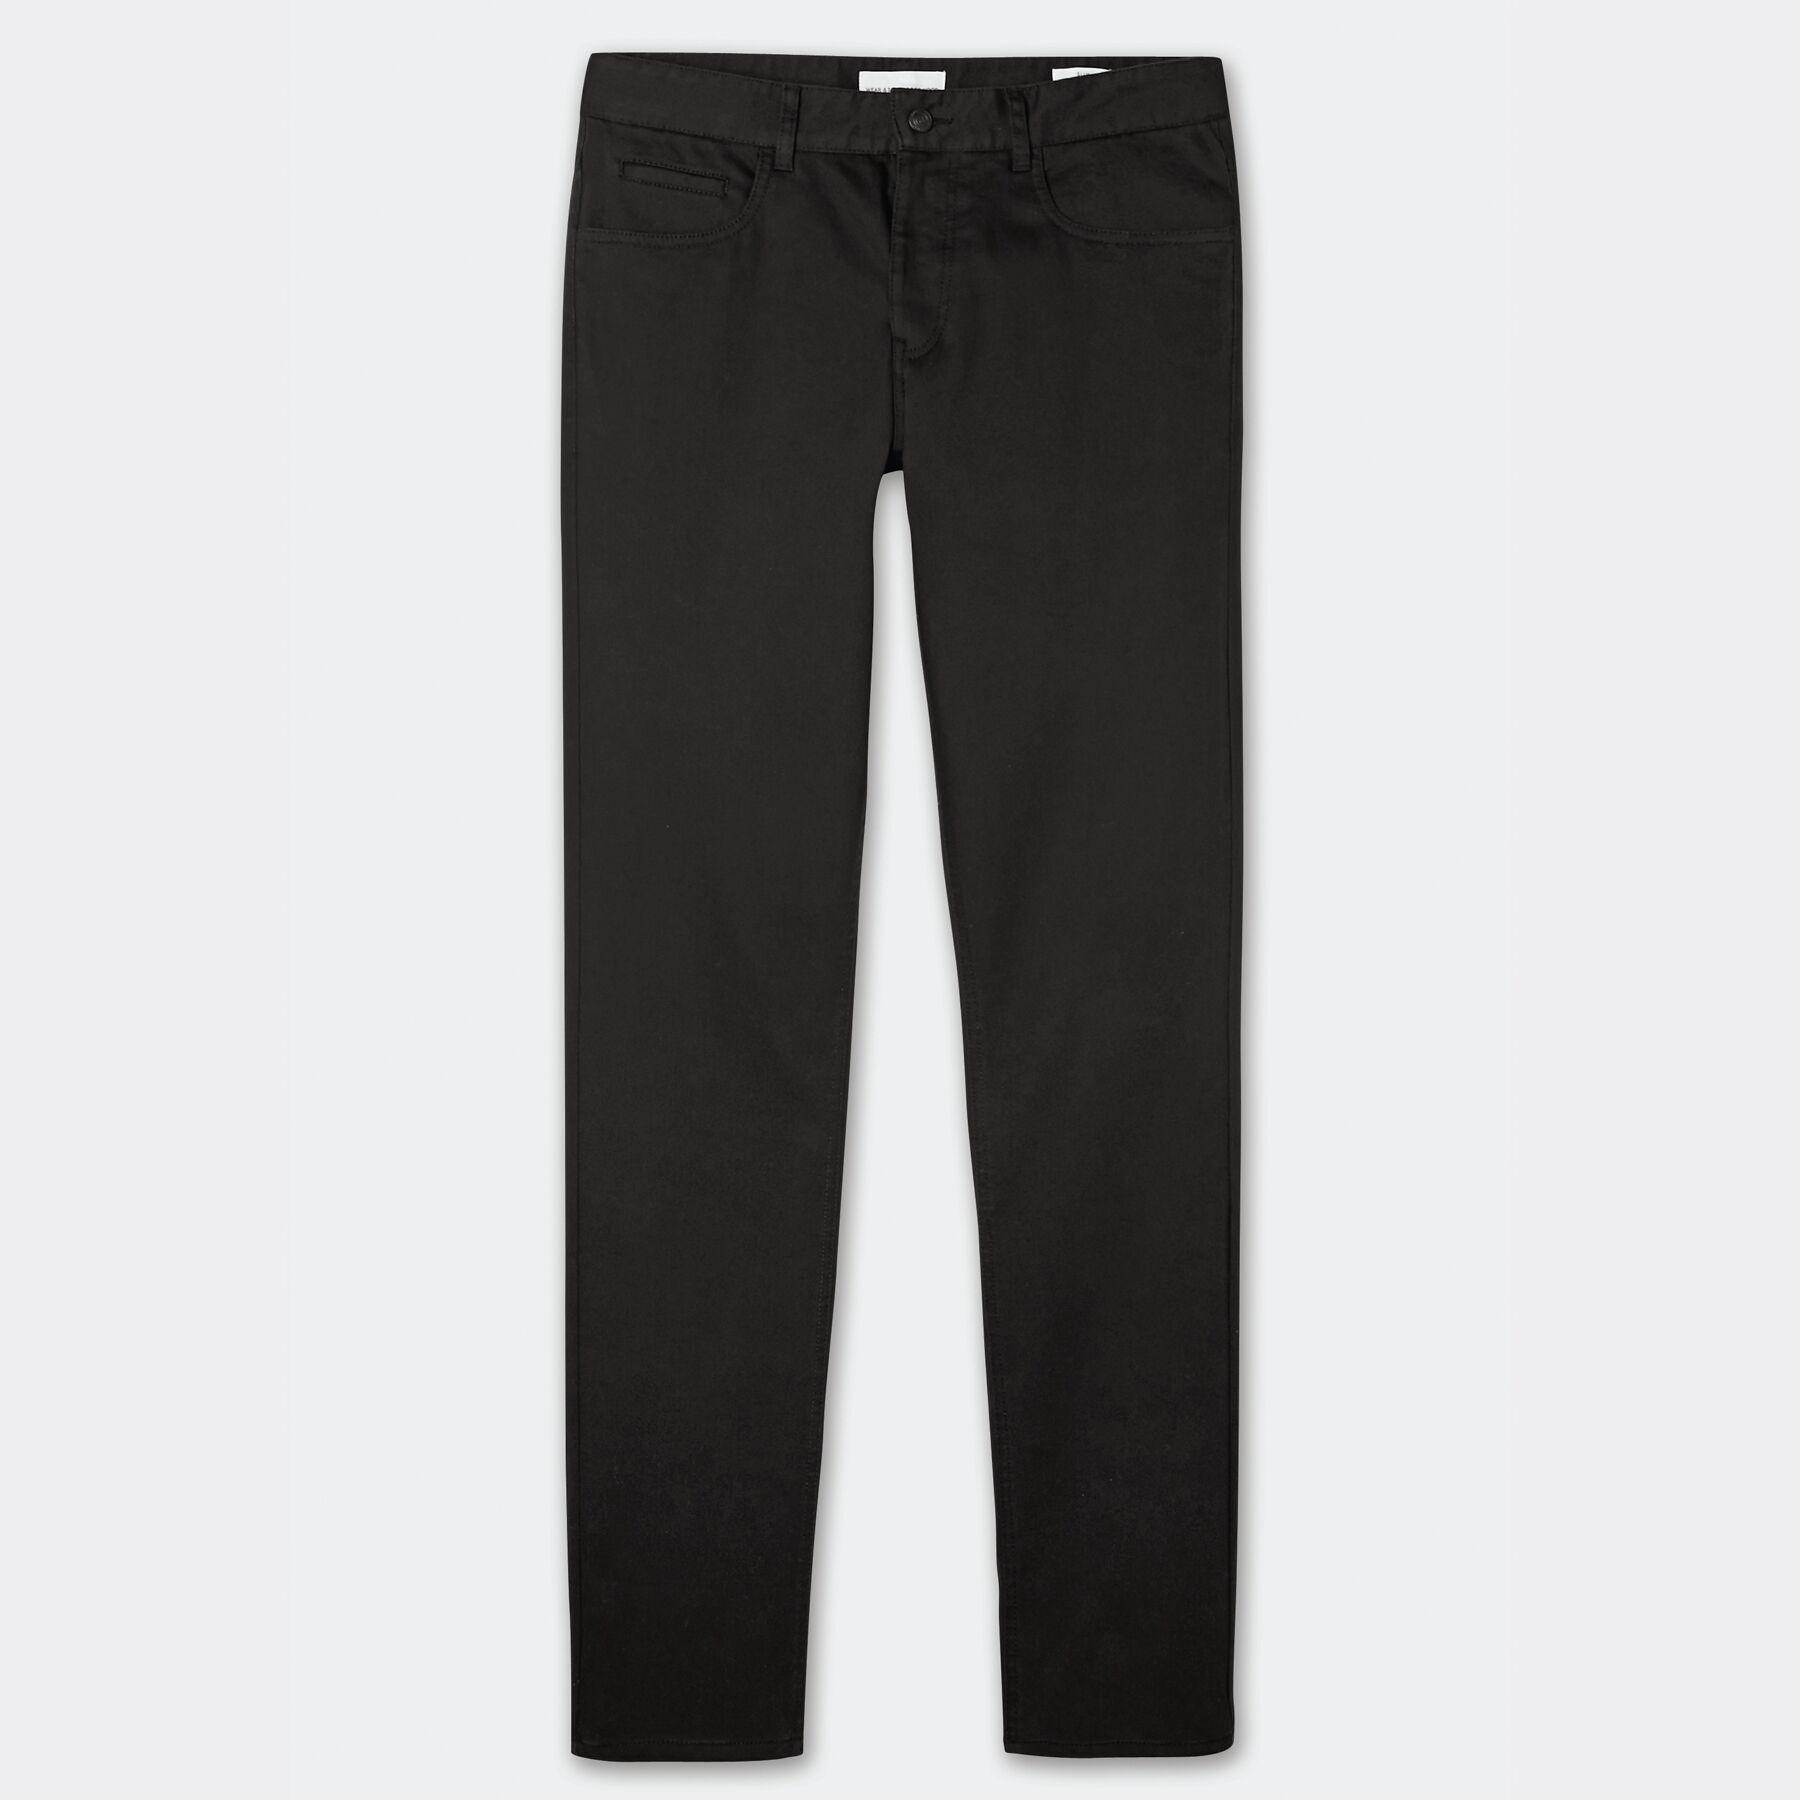 pantalon 5 poches slim noir homme jules. Black Bedroom Furniture Sets. Home Design Ideas